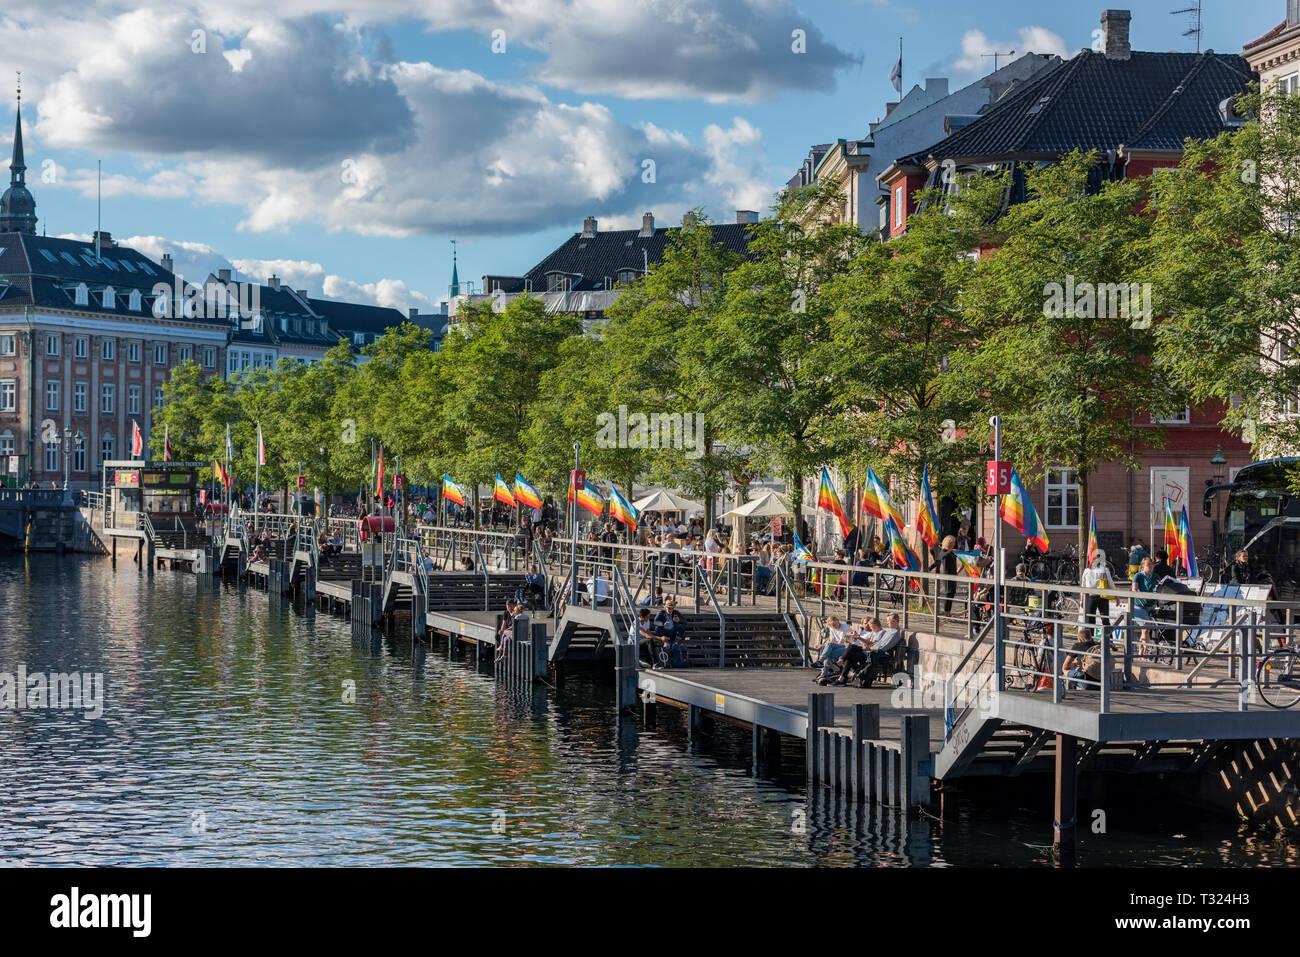 Hygge in action, Danes enjoying the late afternoon September sunshine by the Slotsholmskanalen in Copenhagen - Stock Image